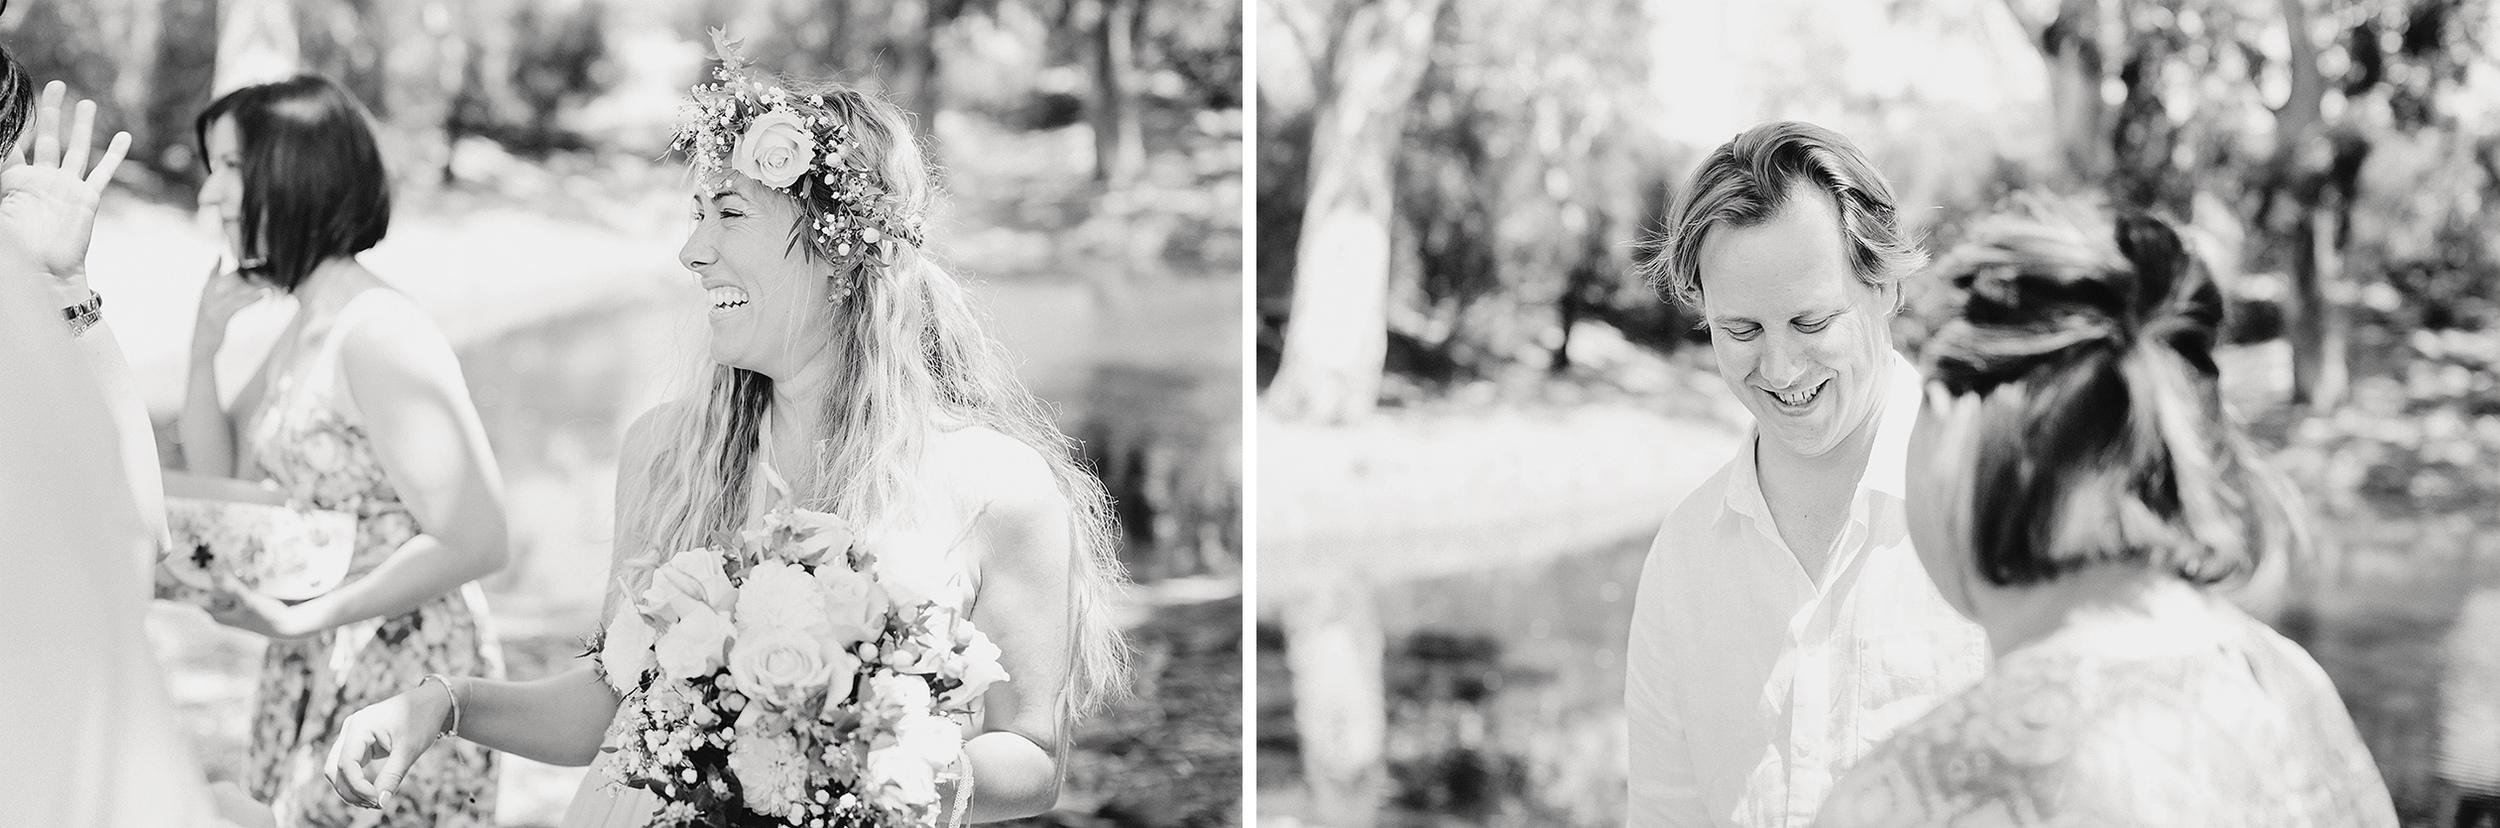 Bohemian McLaren Vale Chaff Shed Wedding 34.jpg